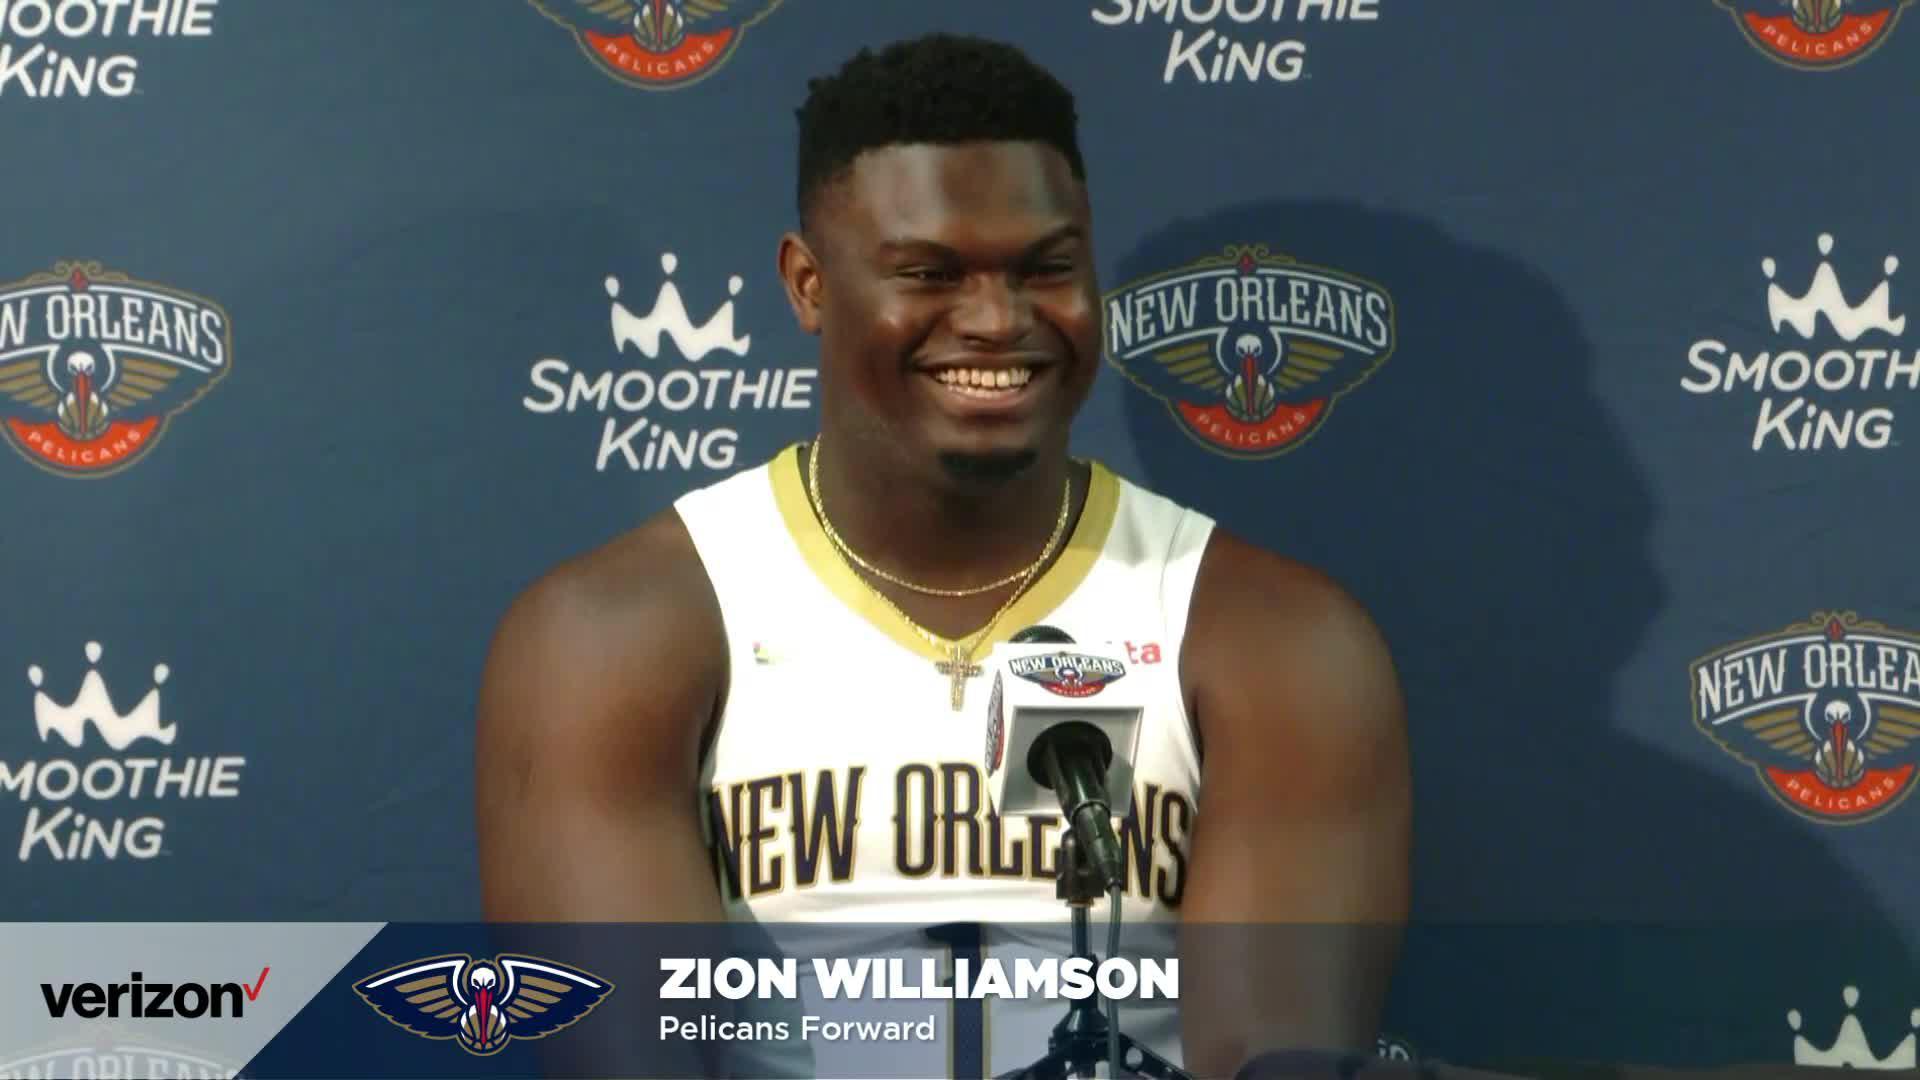 Zion Williamson speaks on his offseason, David Griffin | Pelicans Media Day 2021 Interviews